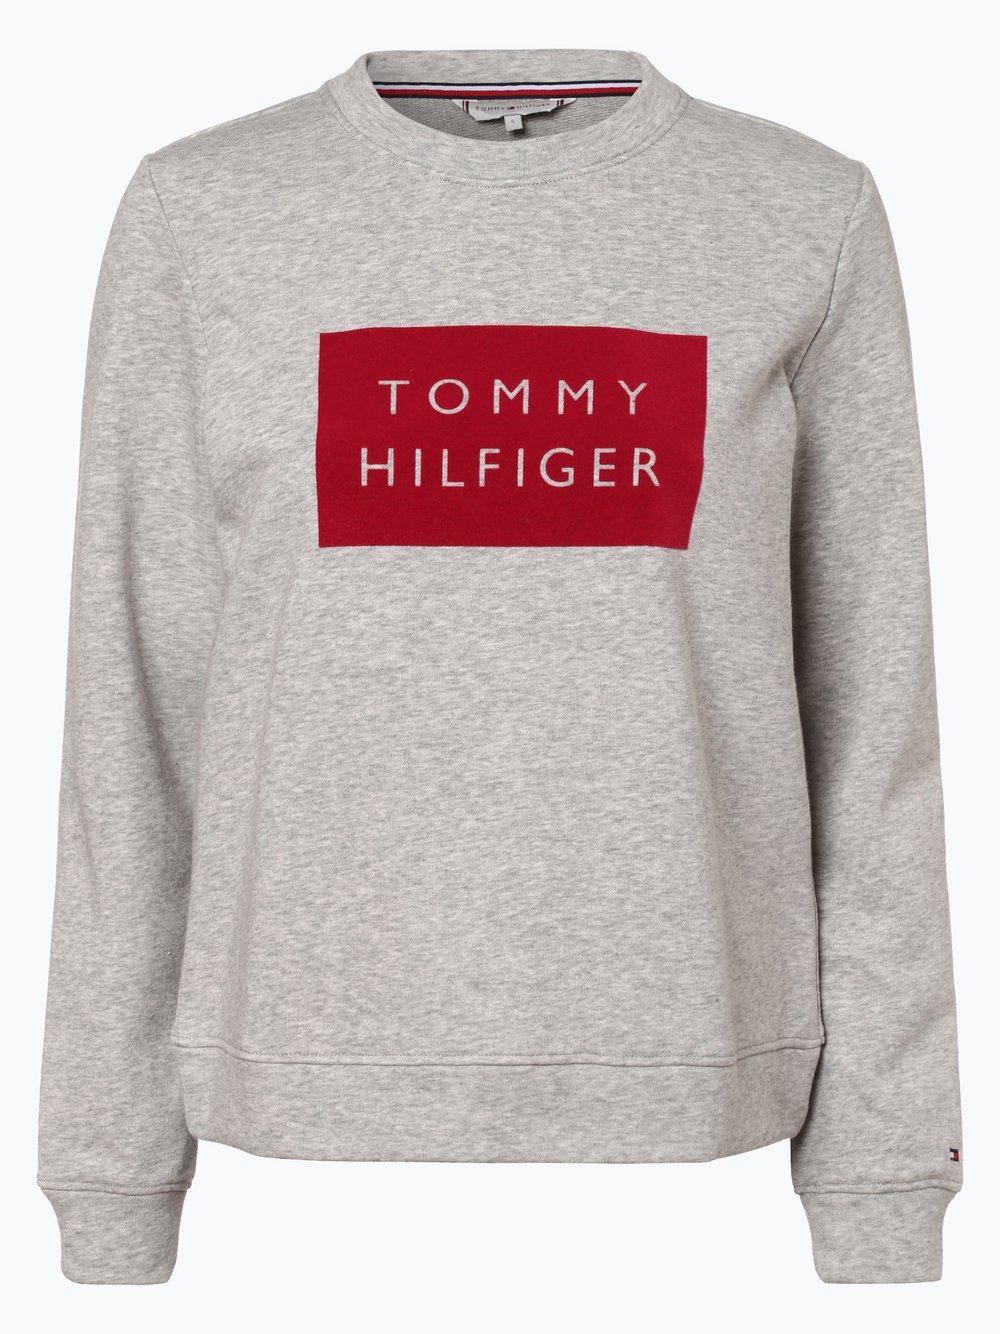 77b4234303072b Tommy Hilfiger Damen Sweatshirt online kaufen | VANGRAAF.COM